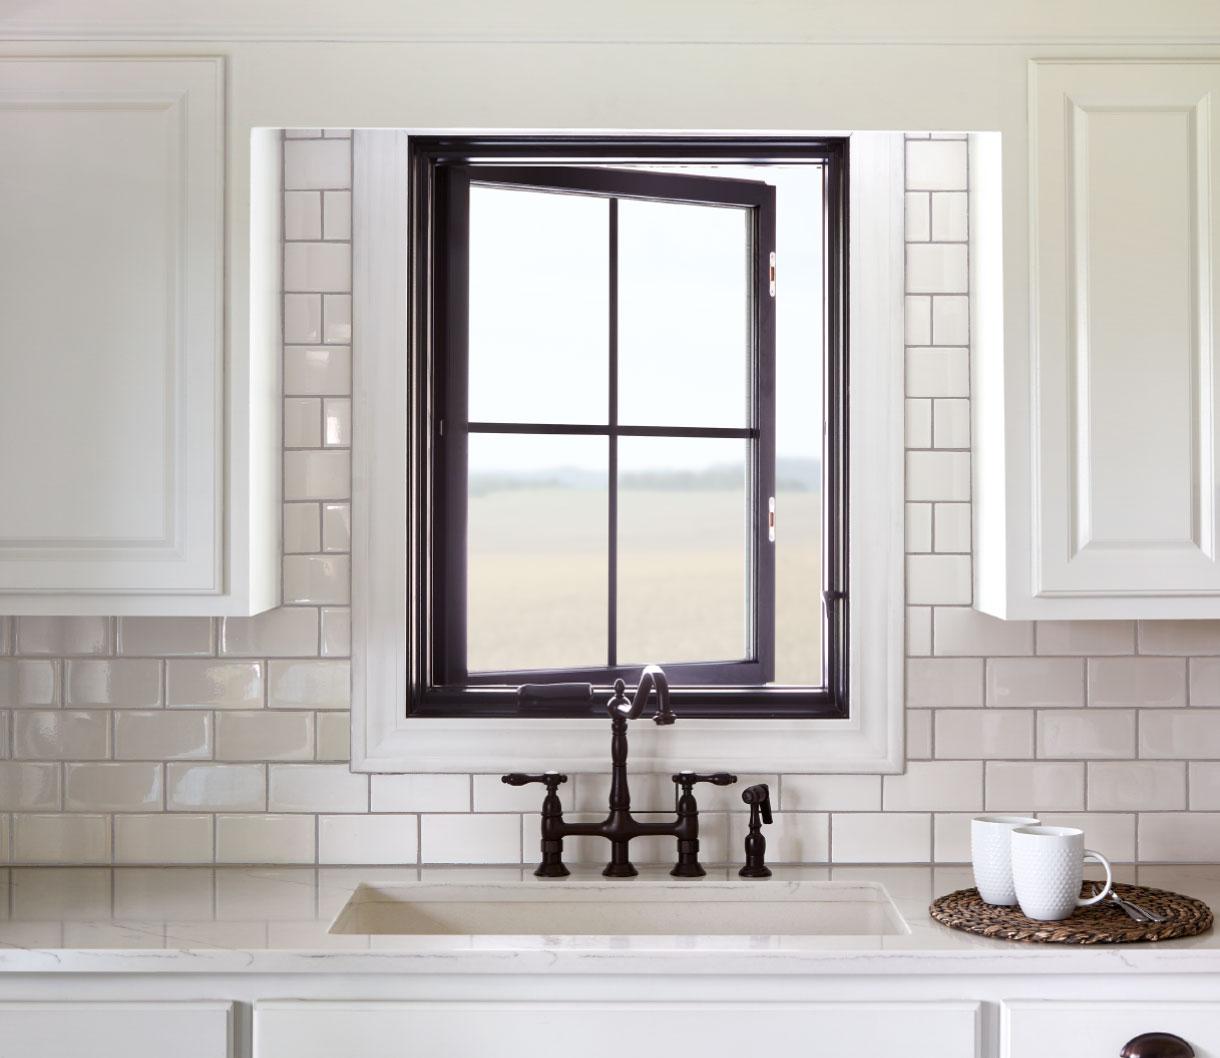 pella architect series traditional wood casement window